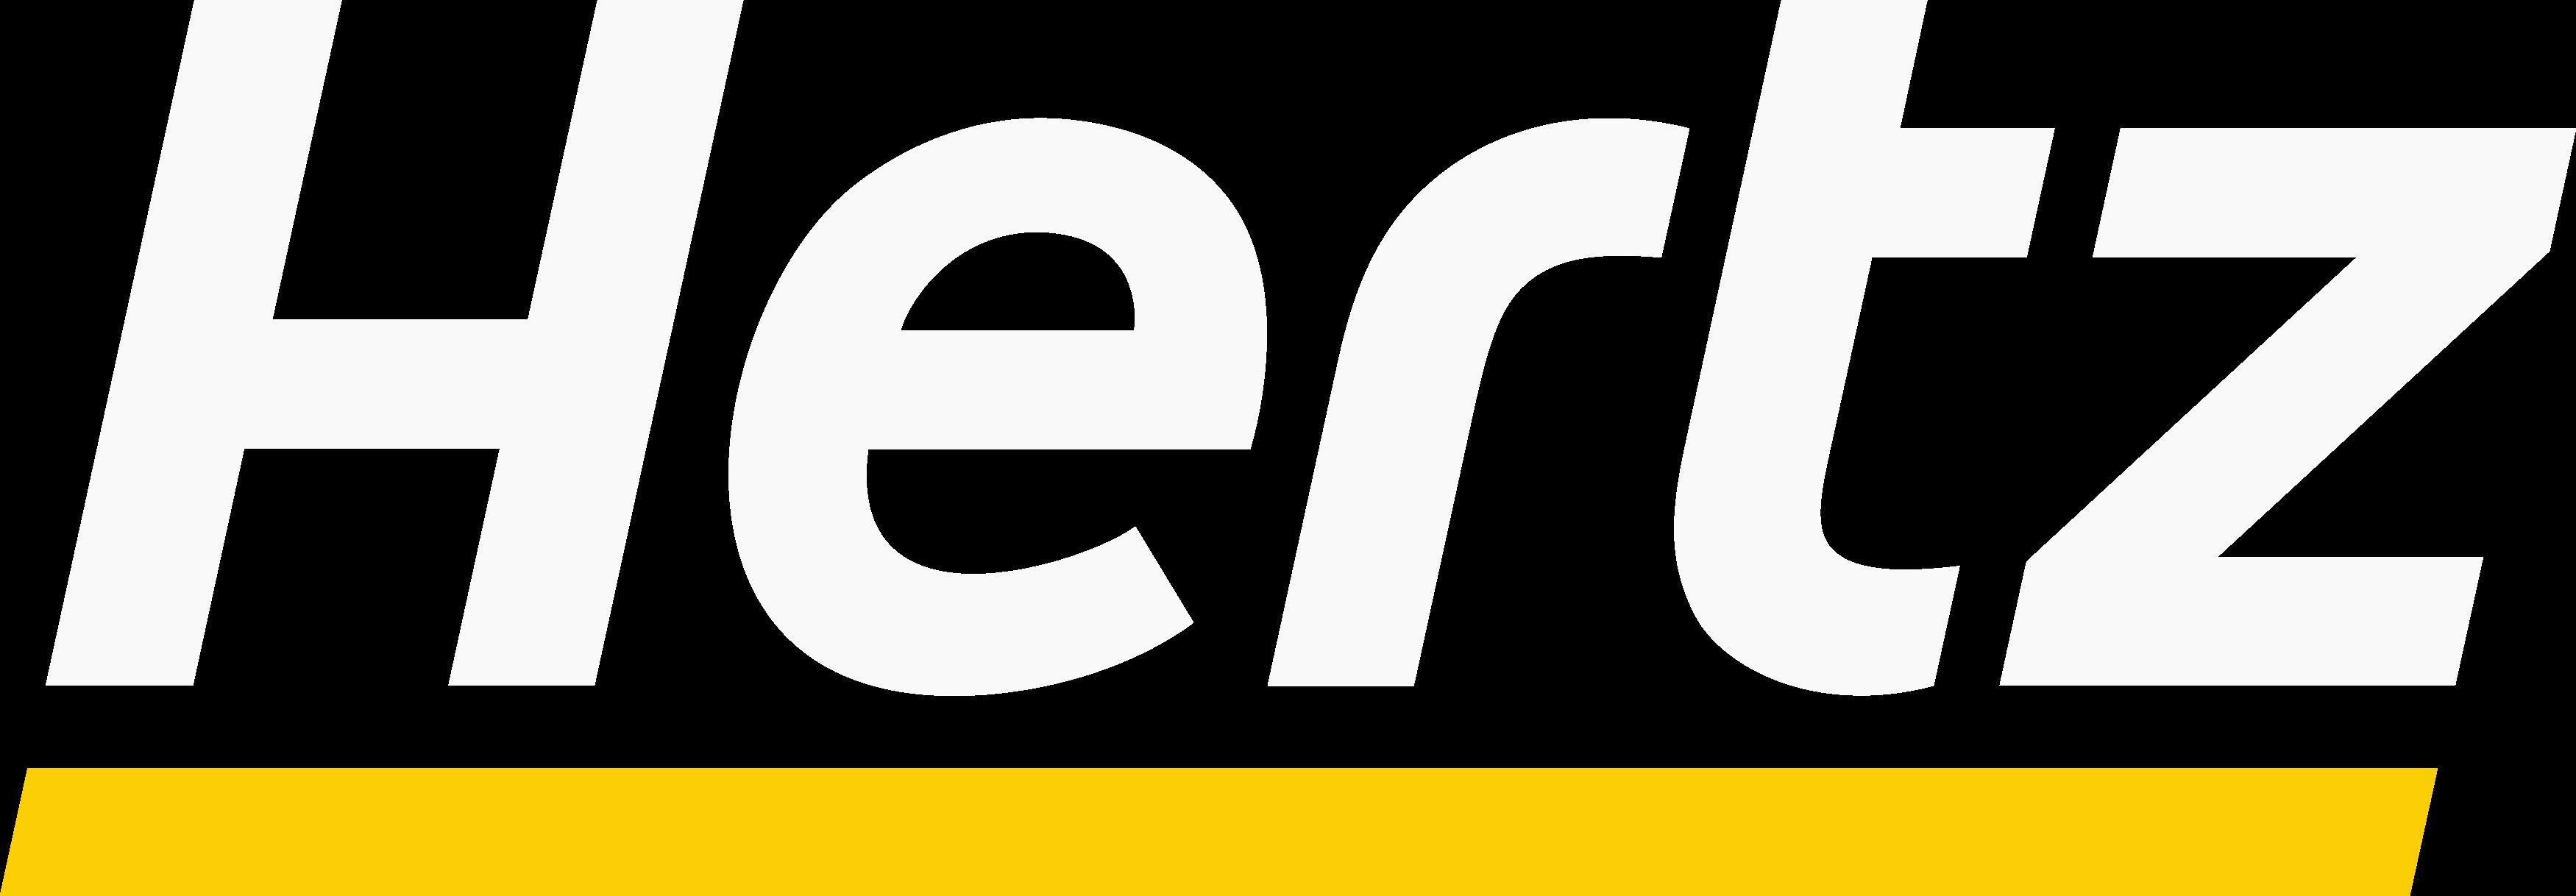 hertz autovuokraamo, logo